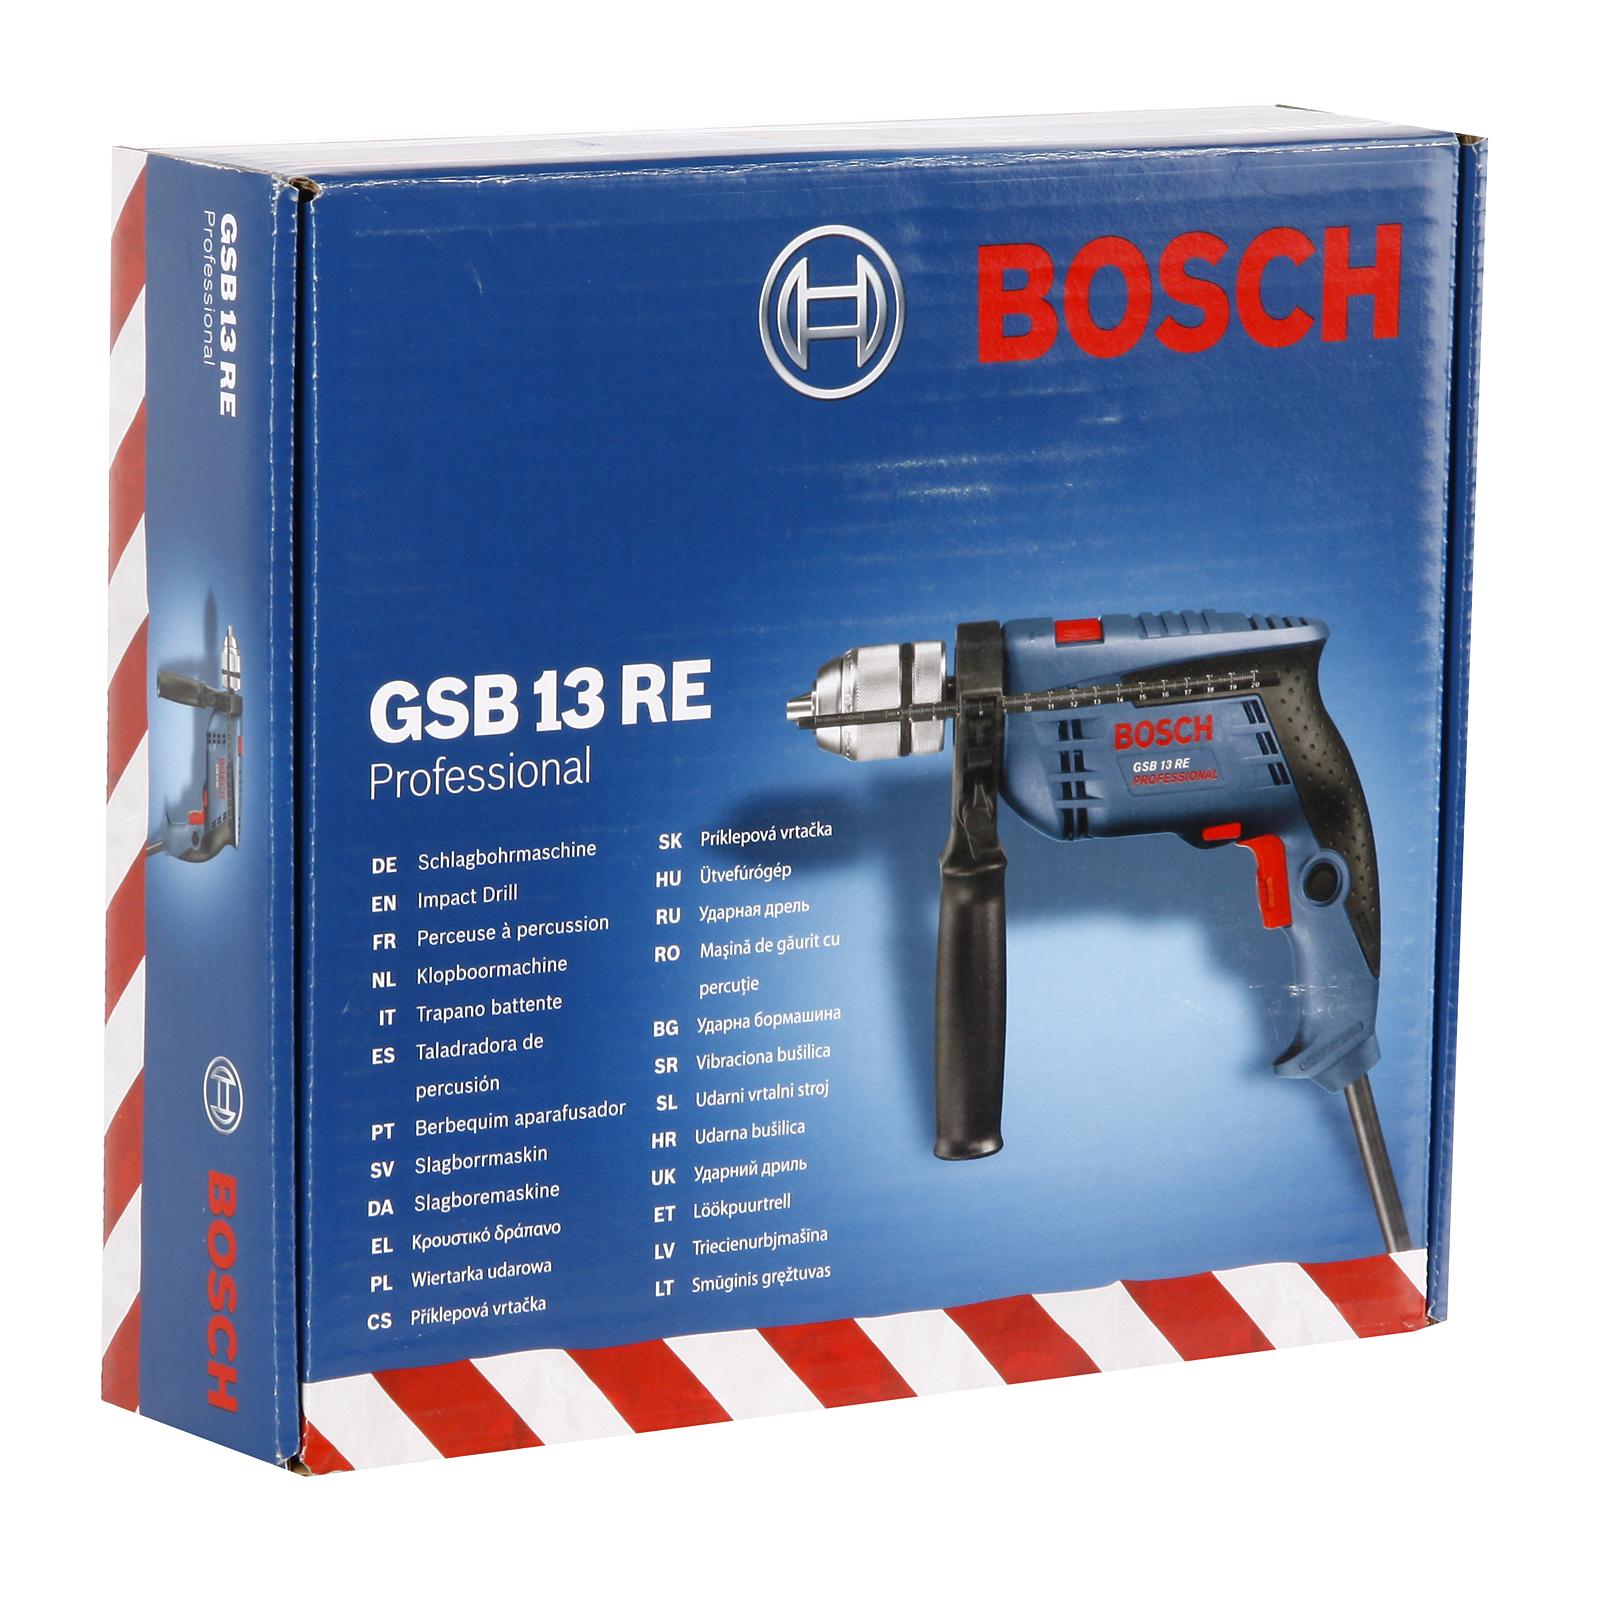 Дрель ударная Bosch Gsb 13 re (0.601.217.100)